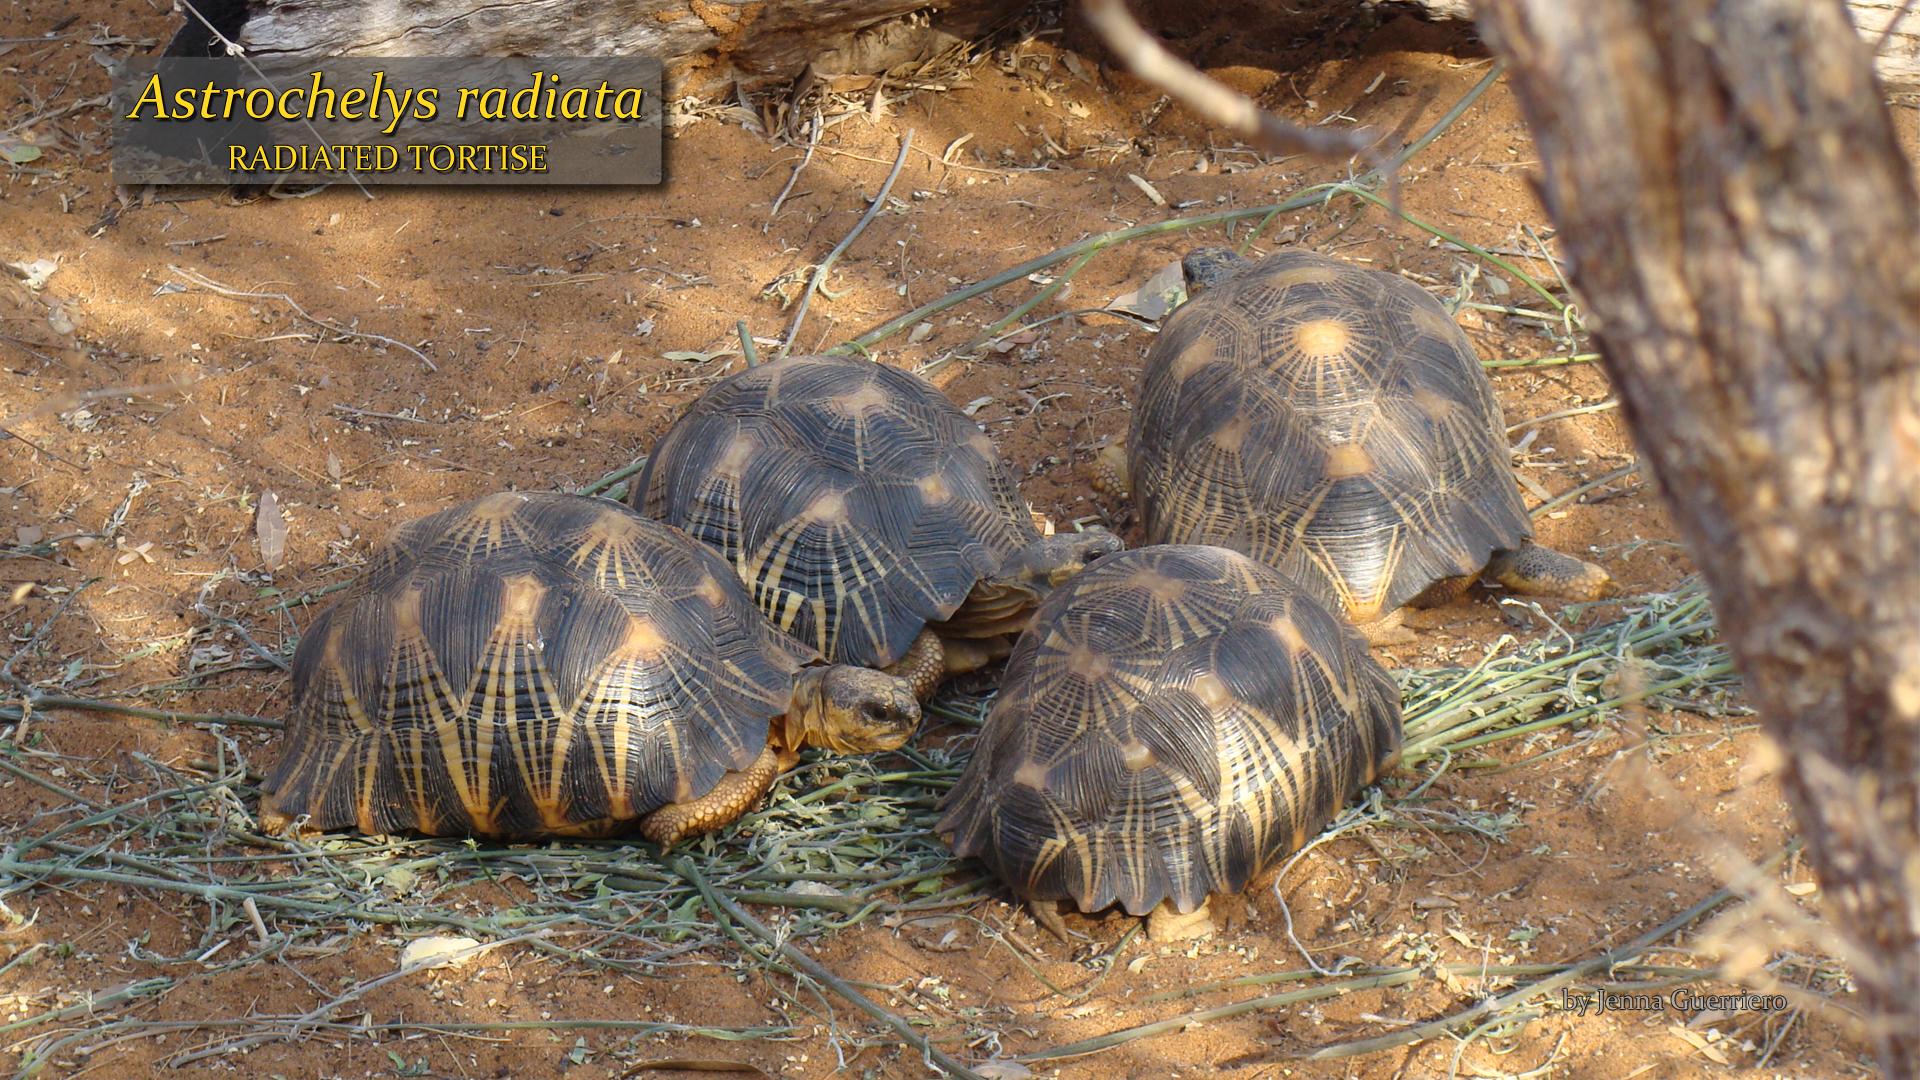 Astrochelys radiata- Jenna Guerriero.jpg